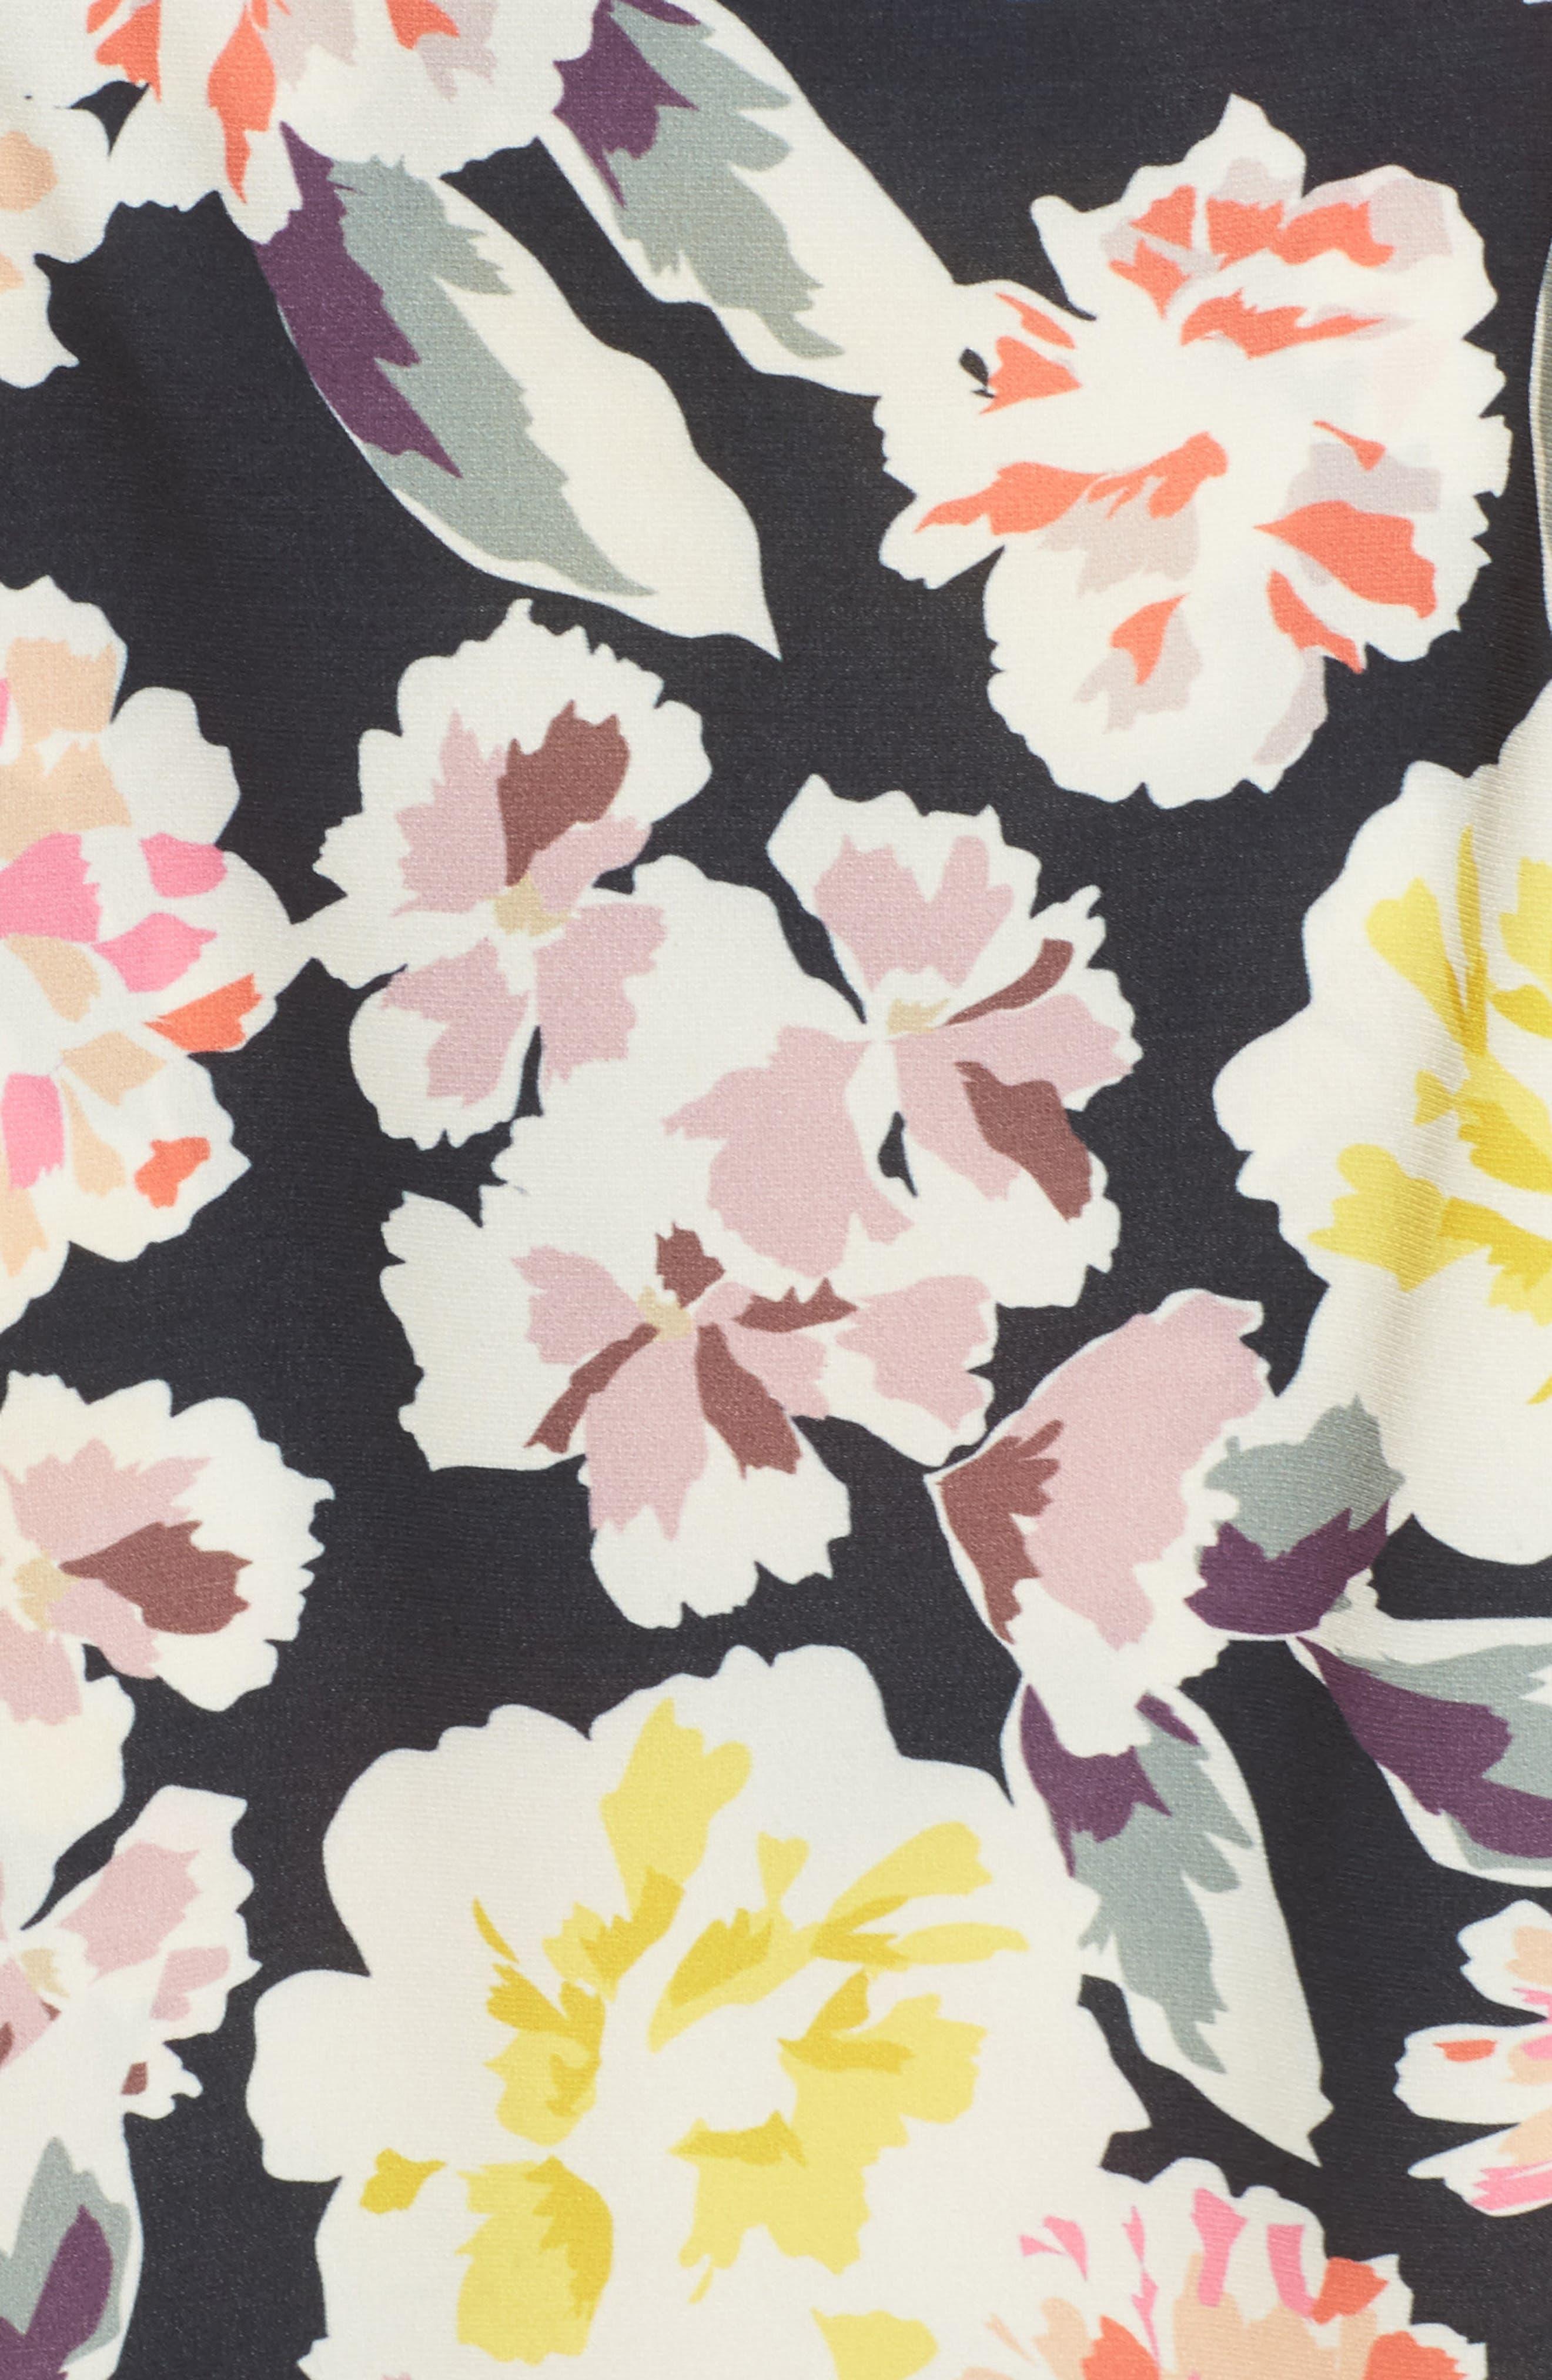 Enoshima Sheath Dress,                             Alternate thumbnail 5, color,                             004